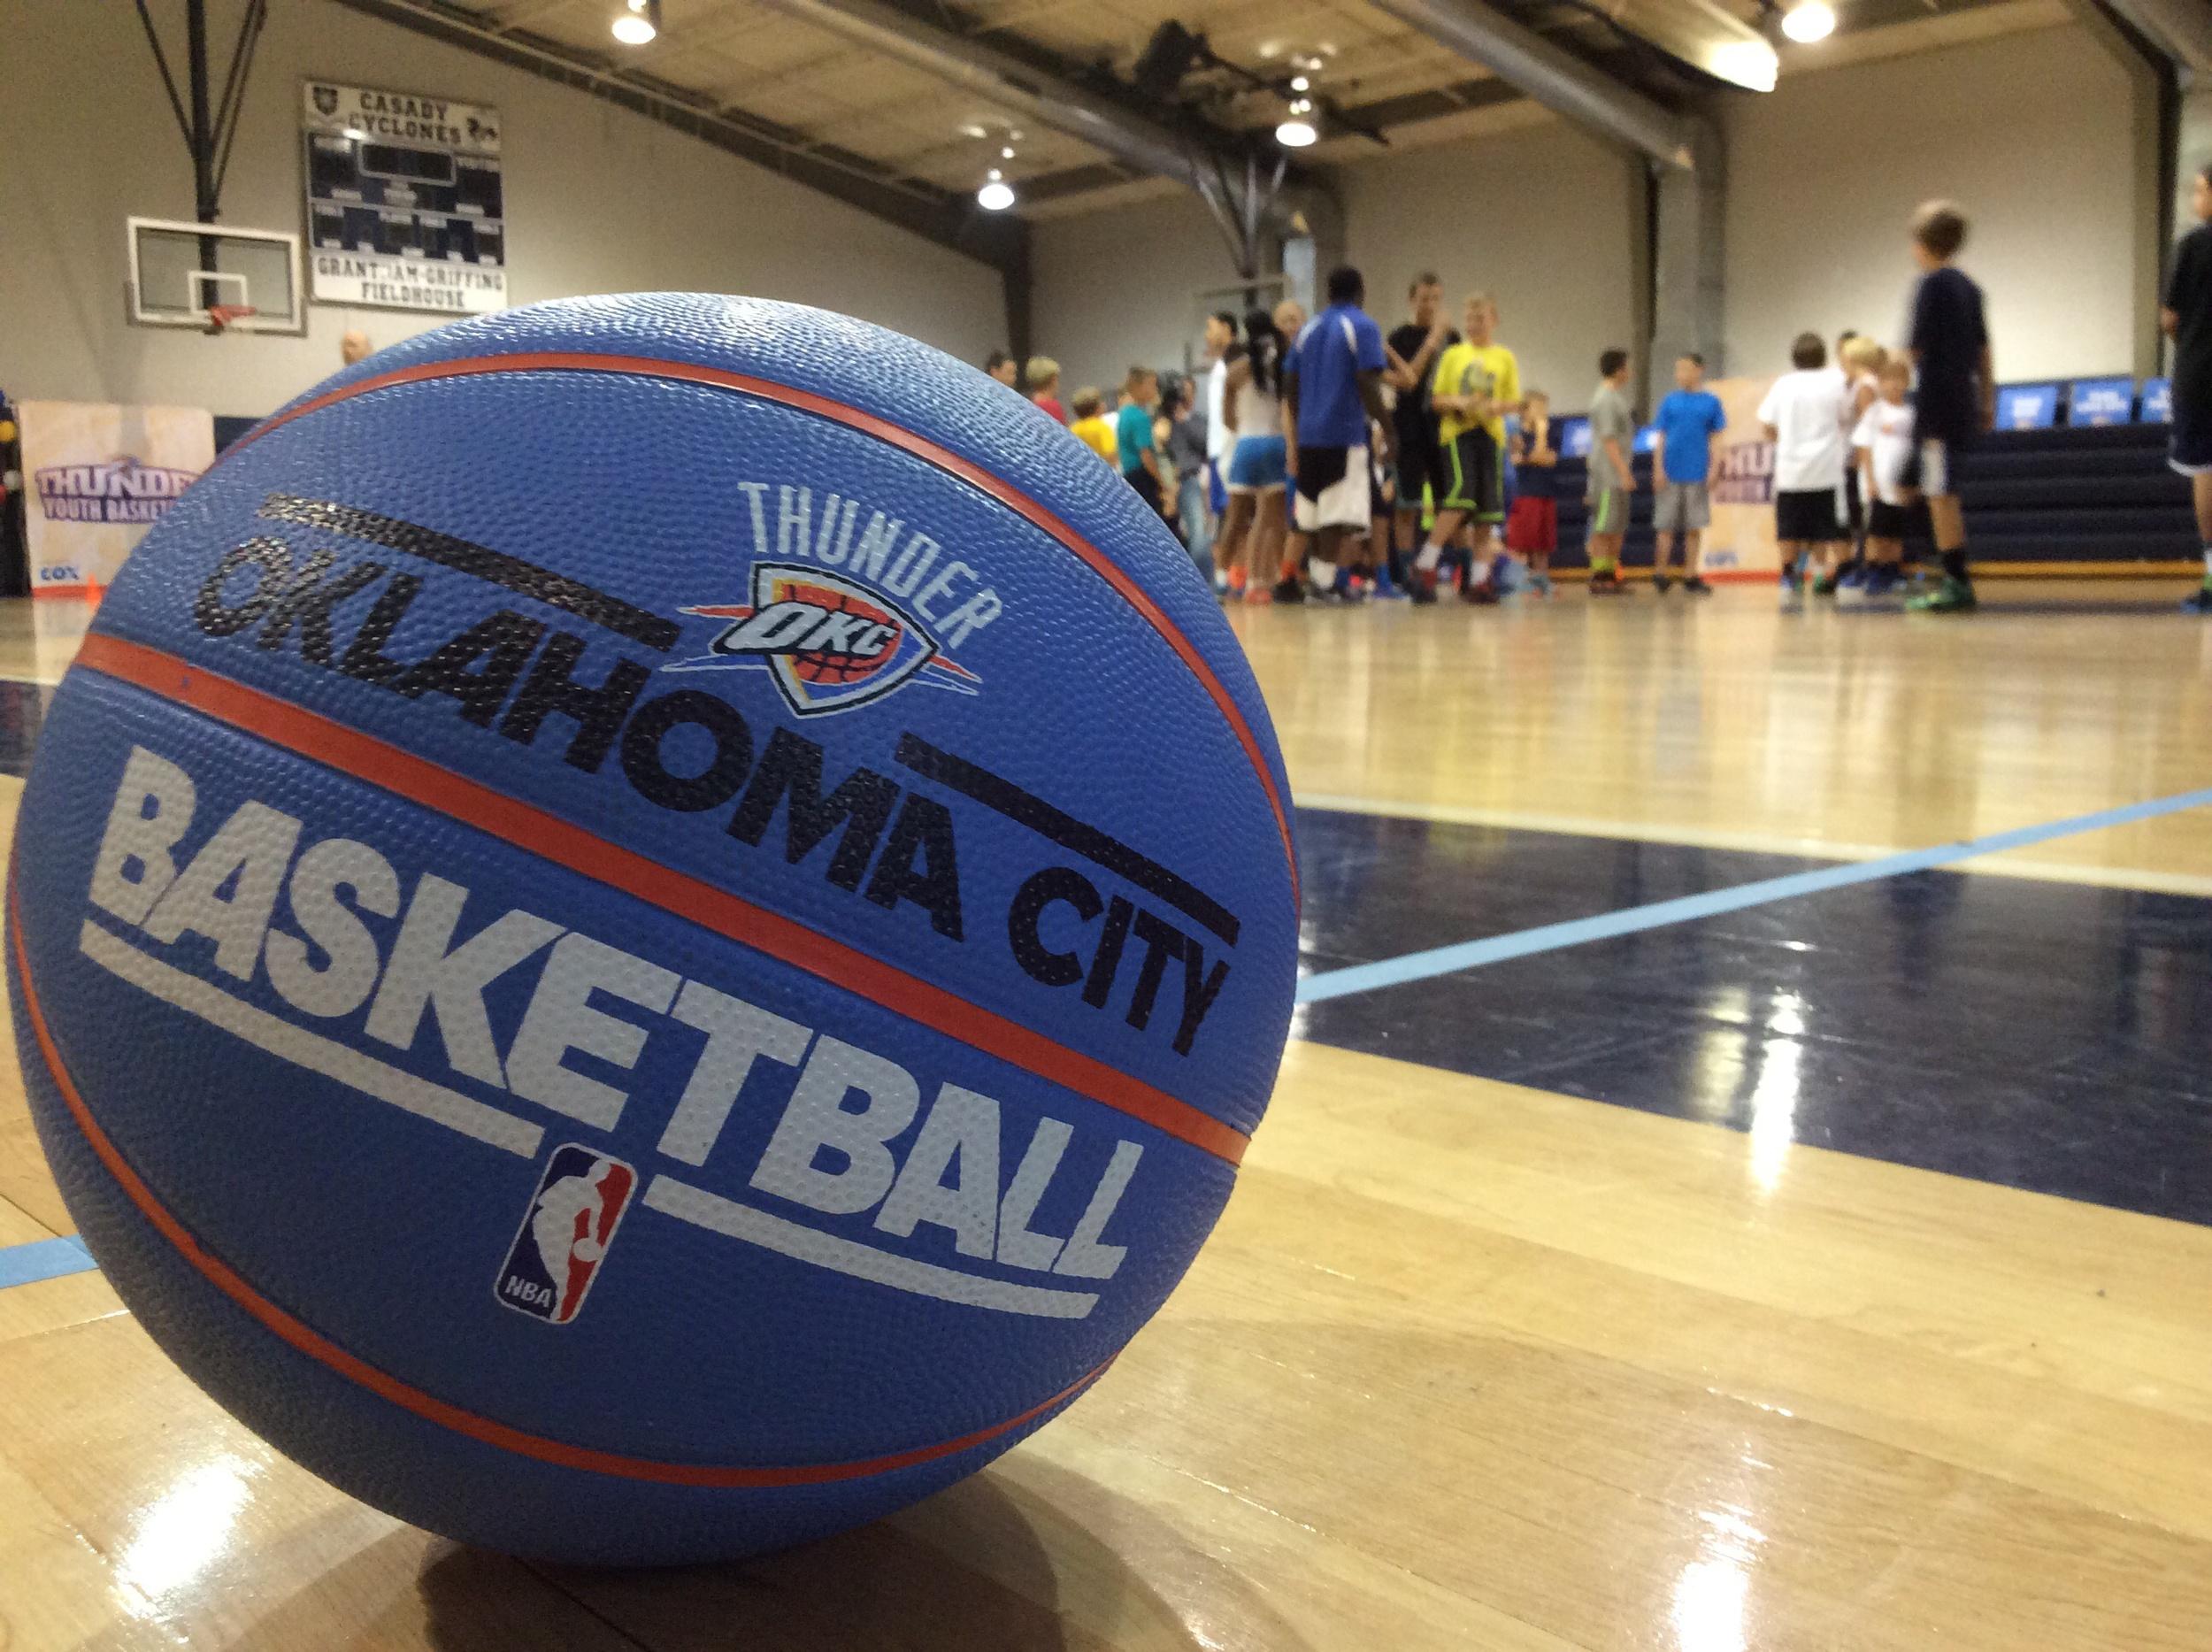 Thunder Youth Basketball Camp at OKC's Casady School. Photo by Randy Renner for InsideThunder.com